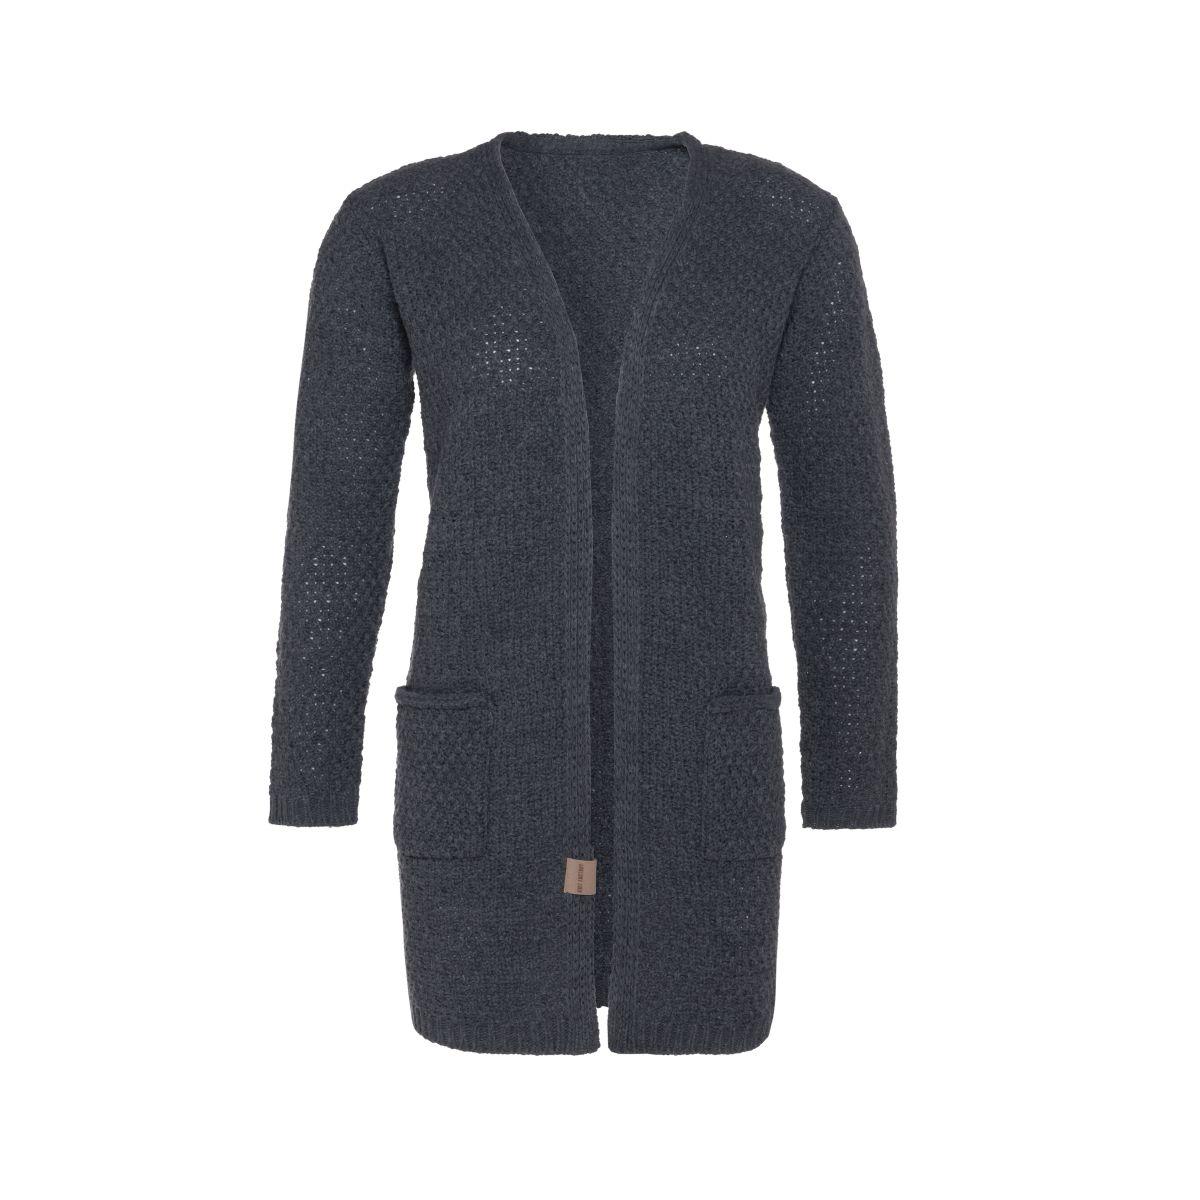 knit factory kf13308101051 luna vest antraciet 4042 1